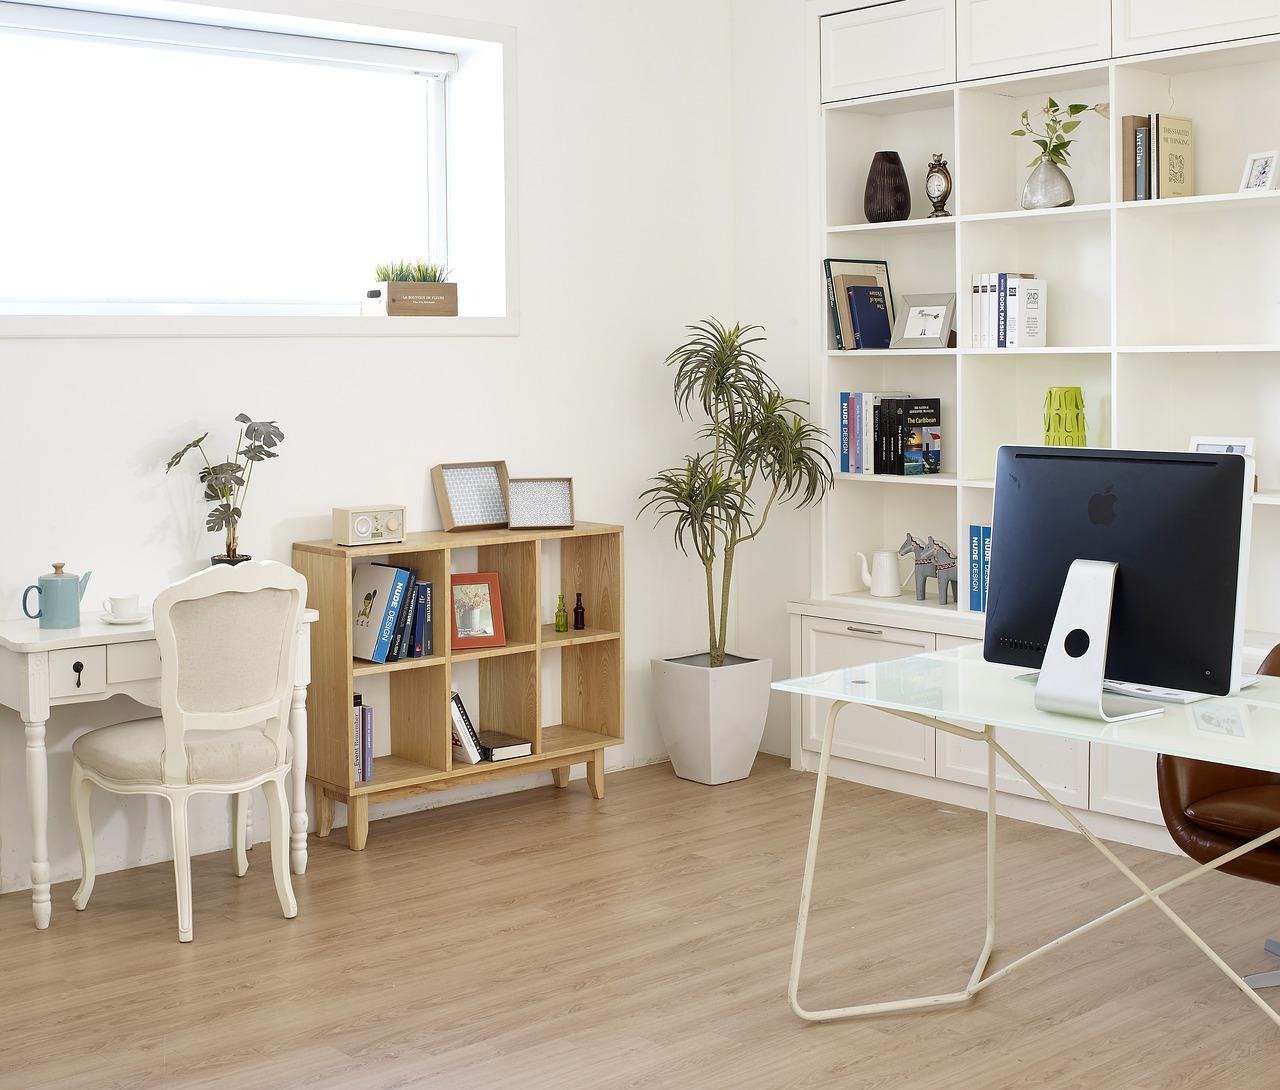 Wohnraumgestaltung Archives - Lebensart Ambiente